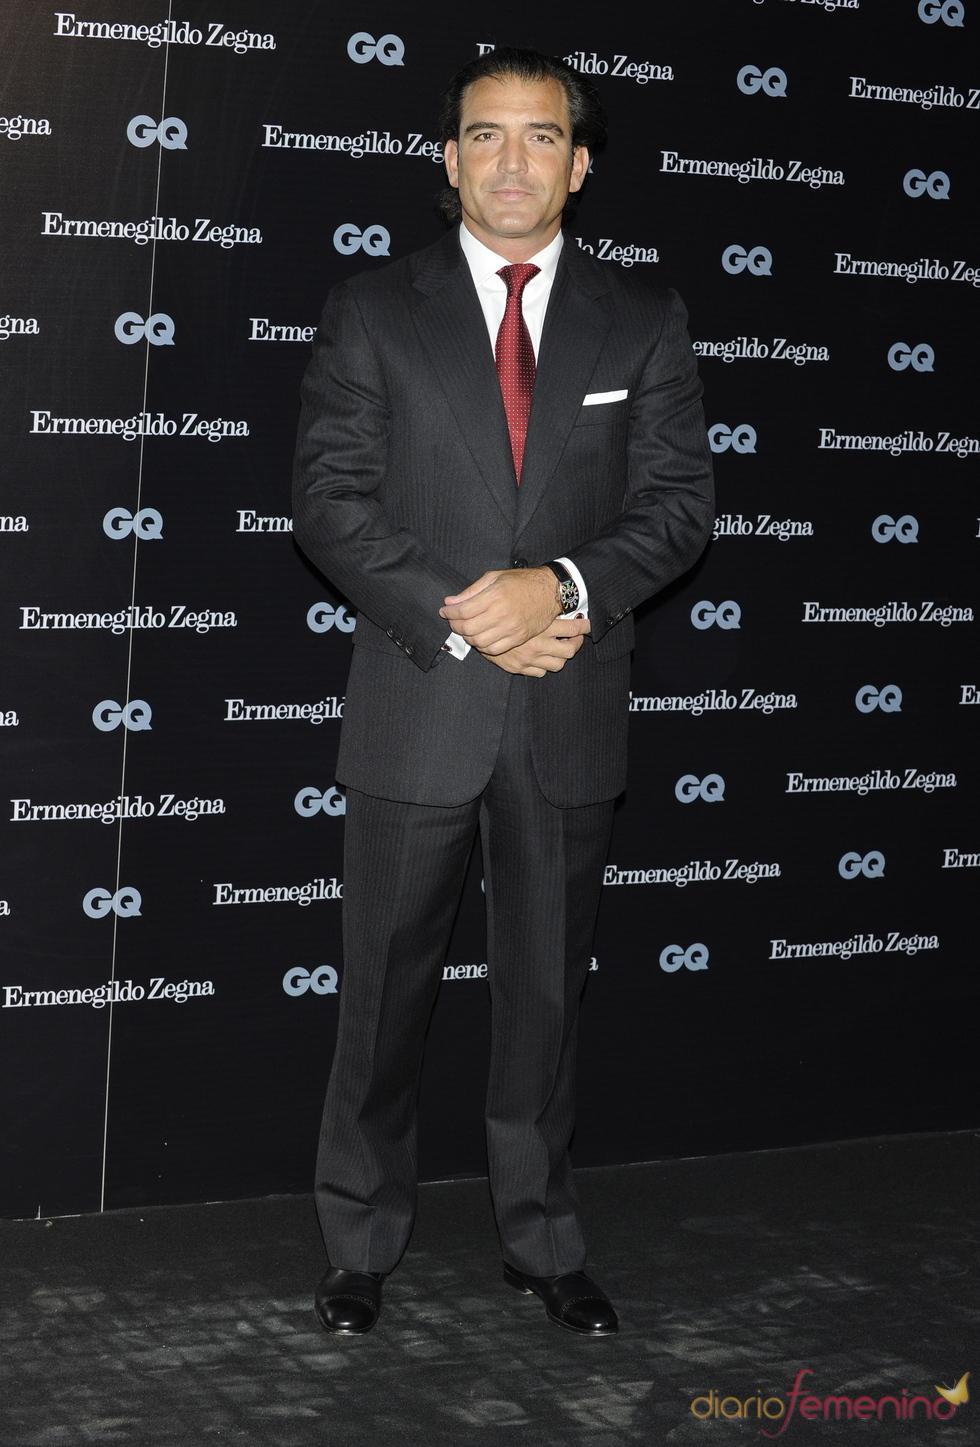 Gigi Sarasola en los Premios GQ 2010